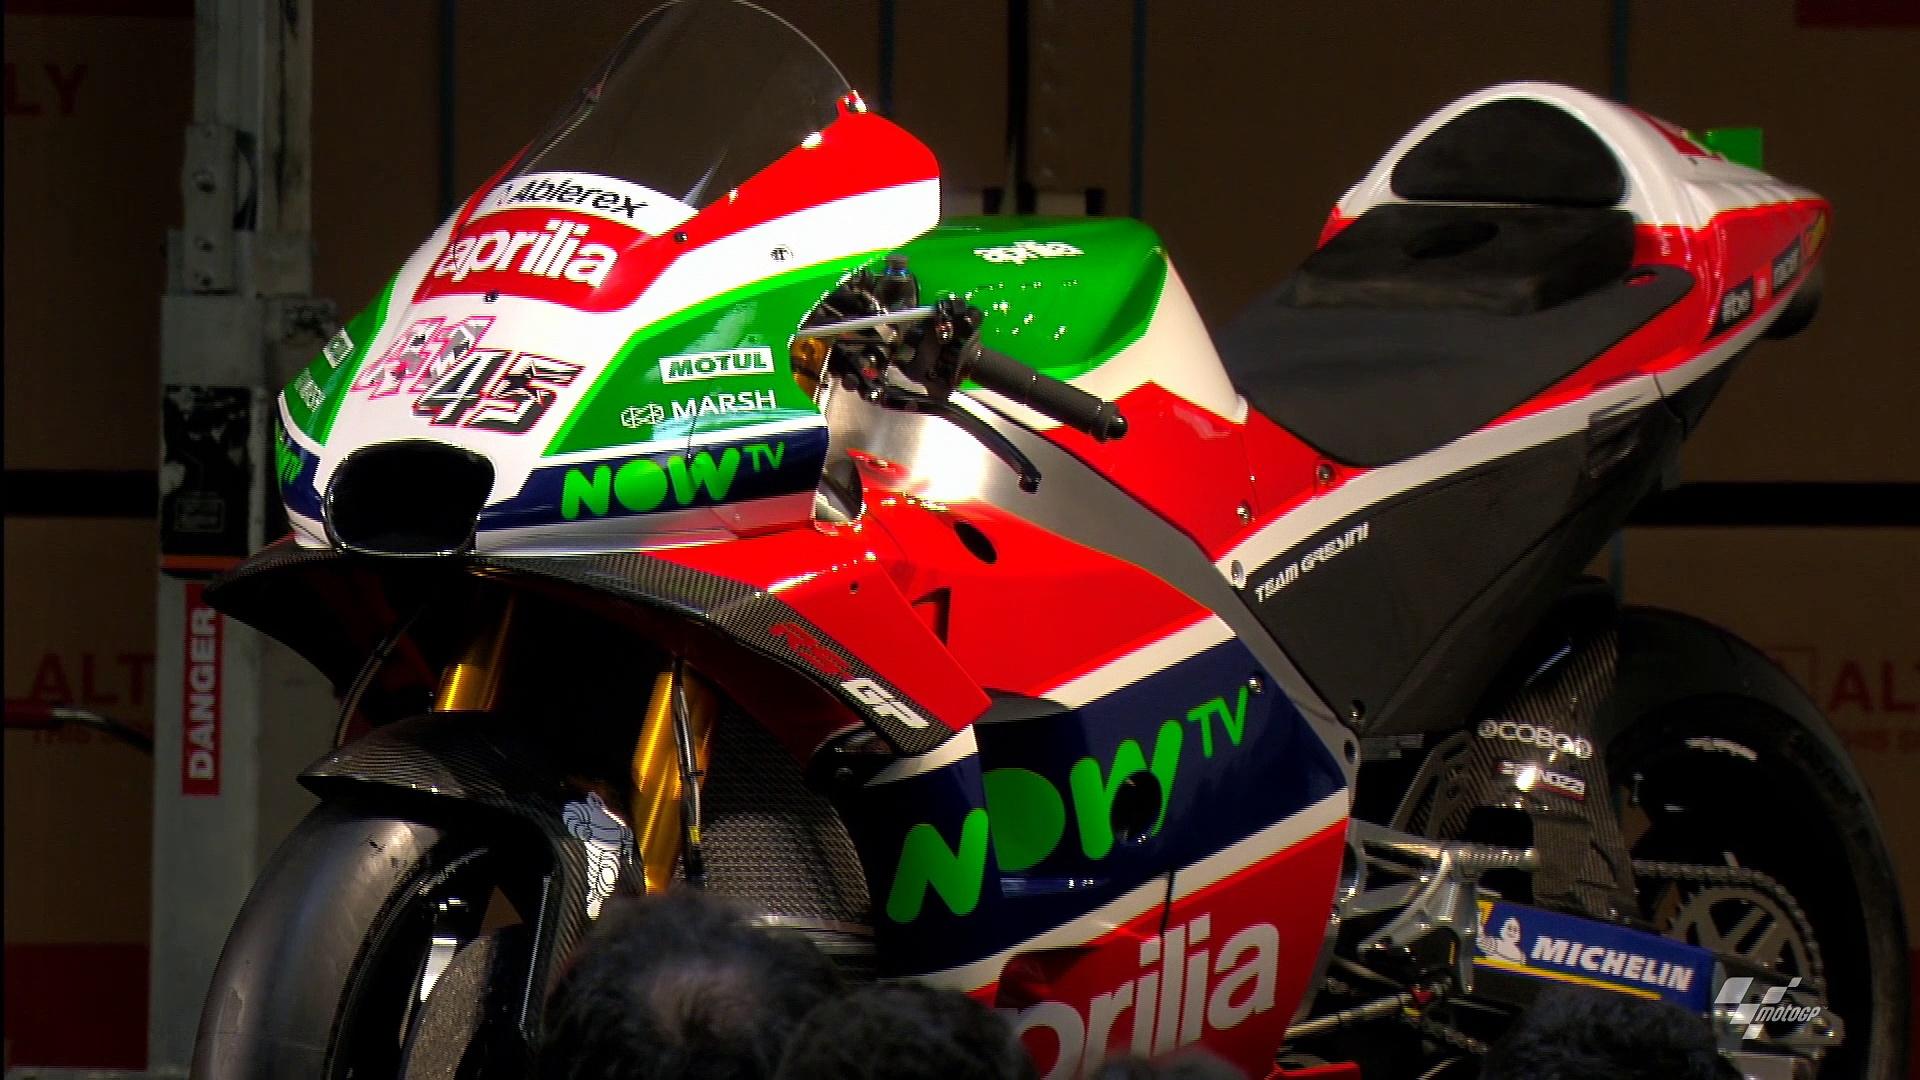 2018 Aprilia MotoGP Presentation